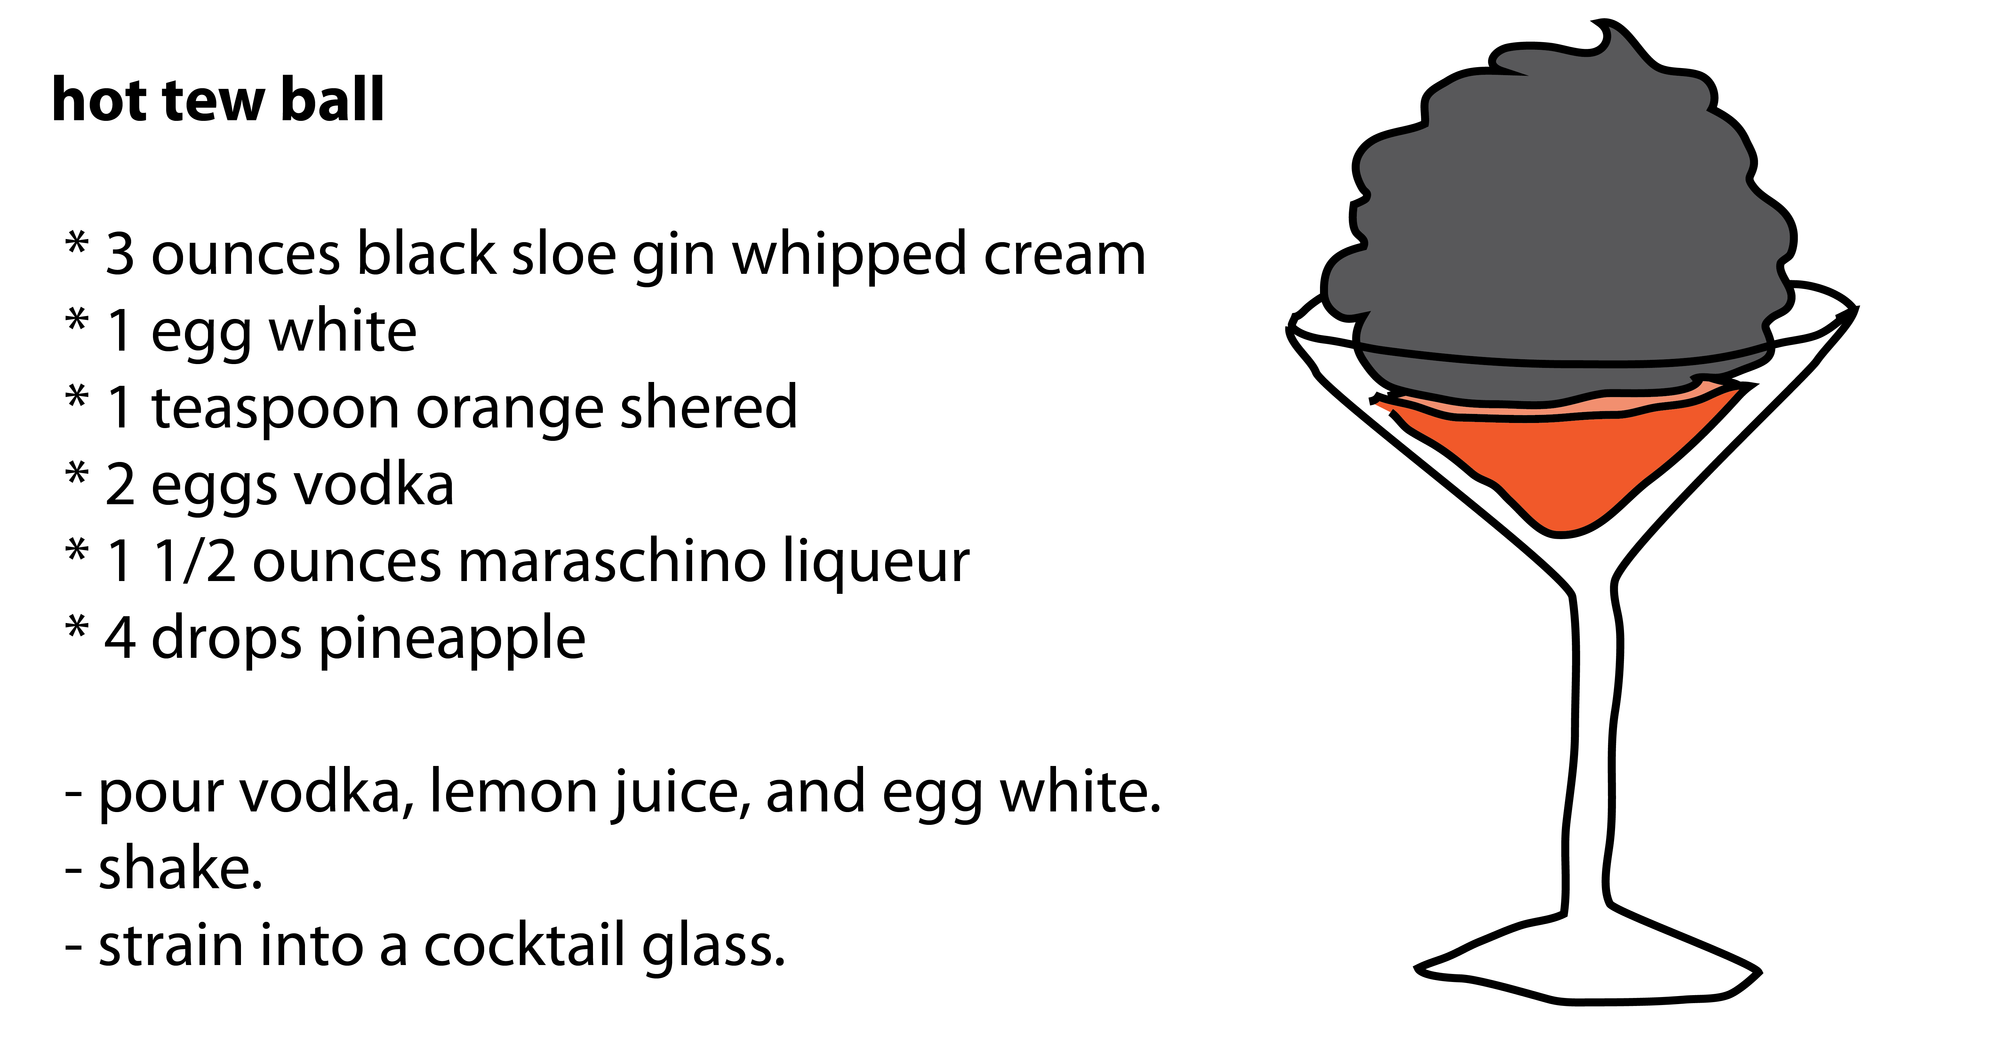 hot tew ball   * 3 ounces black sloe gin whipped cream  * 1 egg white  * 1 teaspoon orange shered  * 2 eggs vodka  * 1 1/2 ounces maraschino liqueur  * 4 drops pineapple   - pour vodka, lemon juice, and egg white.  - shake.  - strain into a cocktail glass.